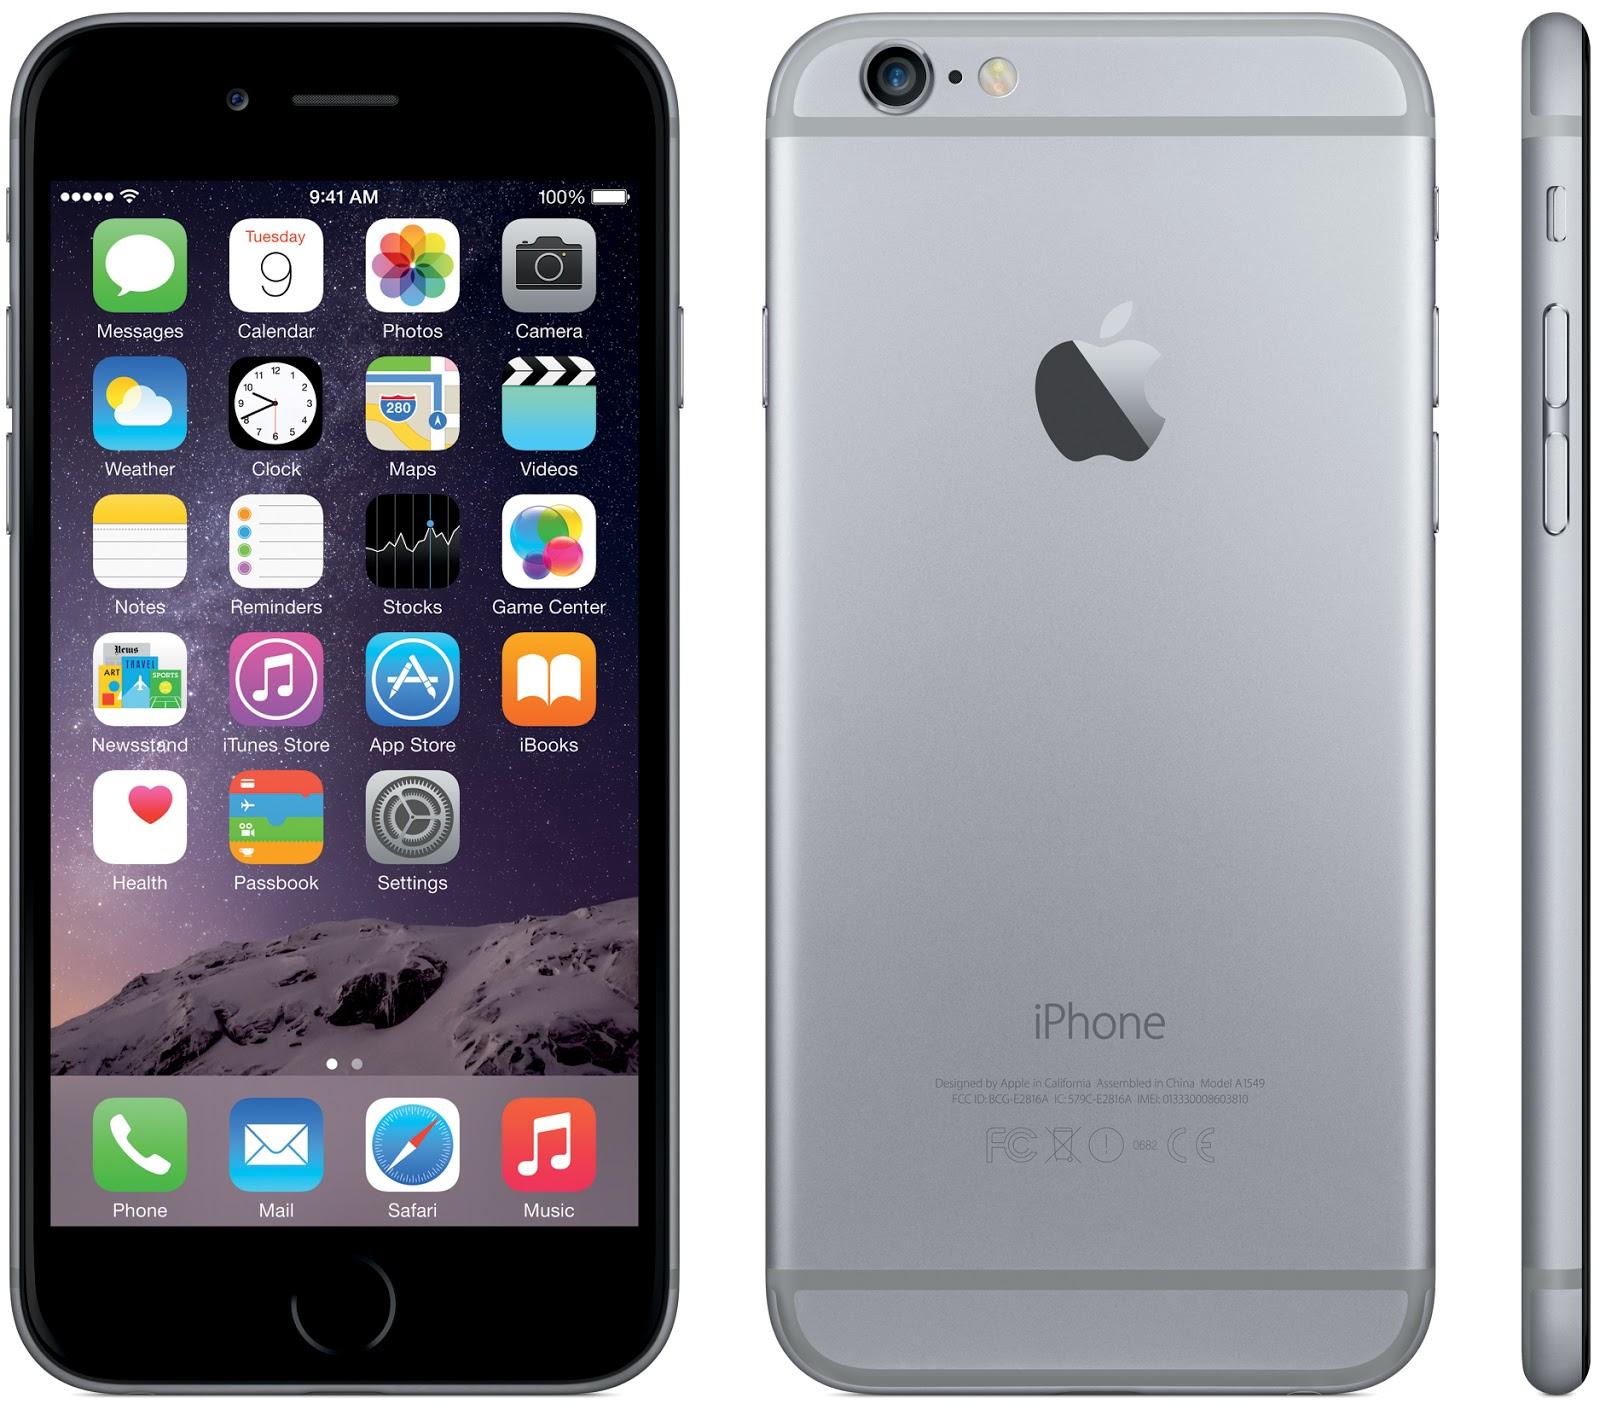 Menilik Kisaran Harga Iphone 6 16GB Second Terbaru yang Paling Murah